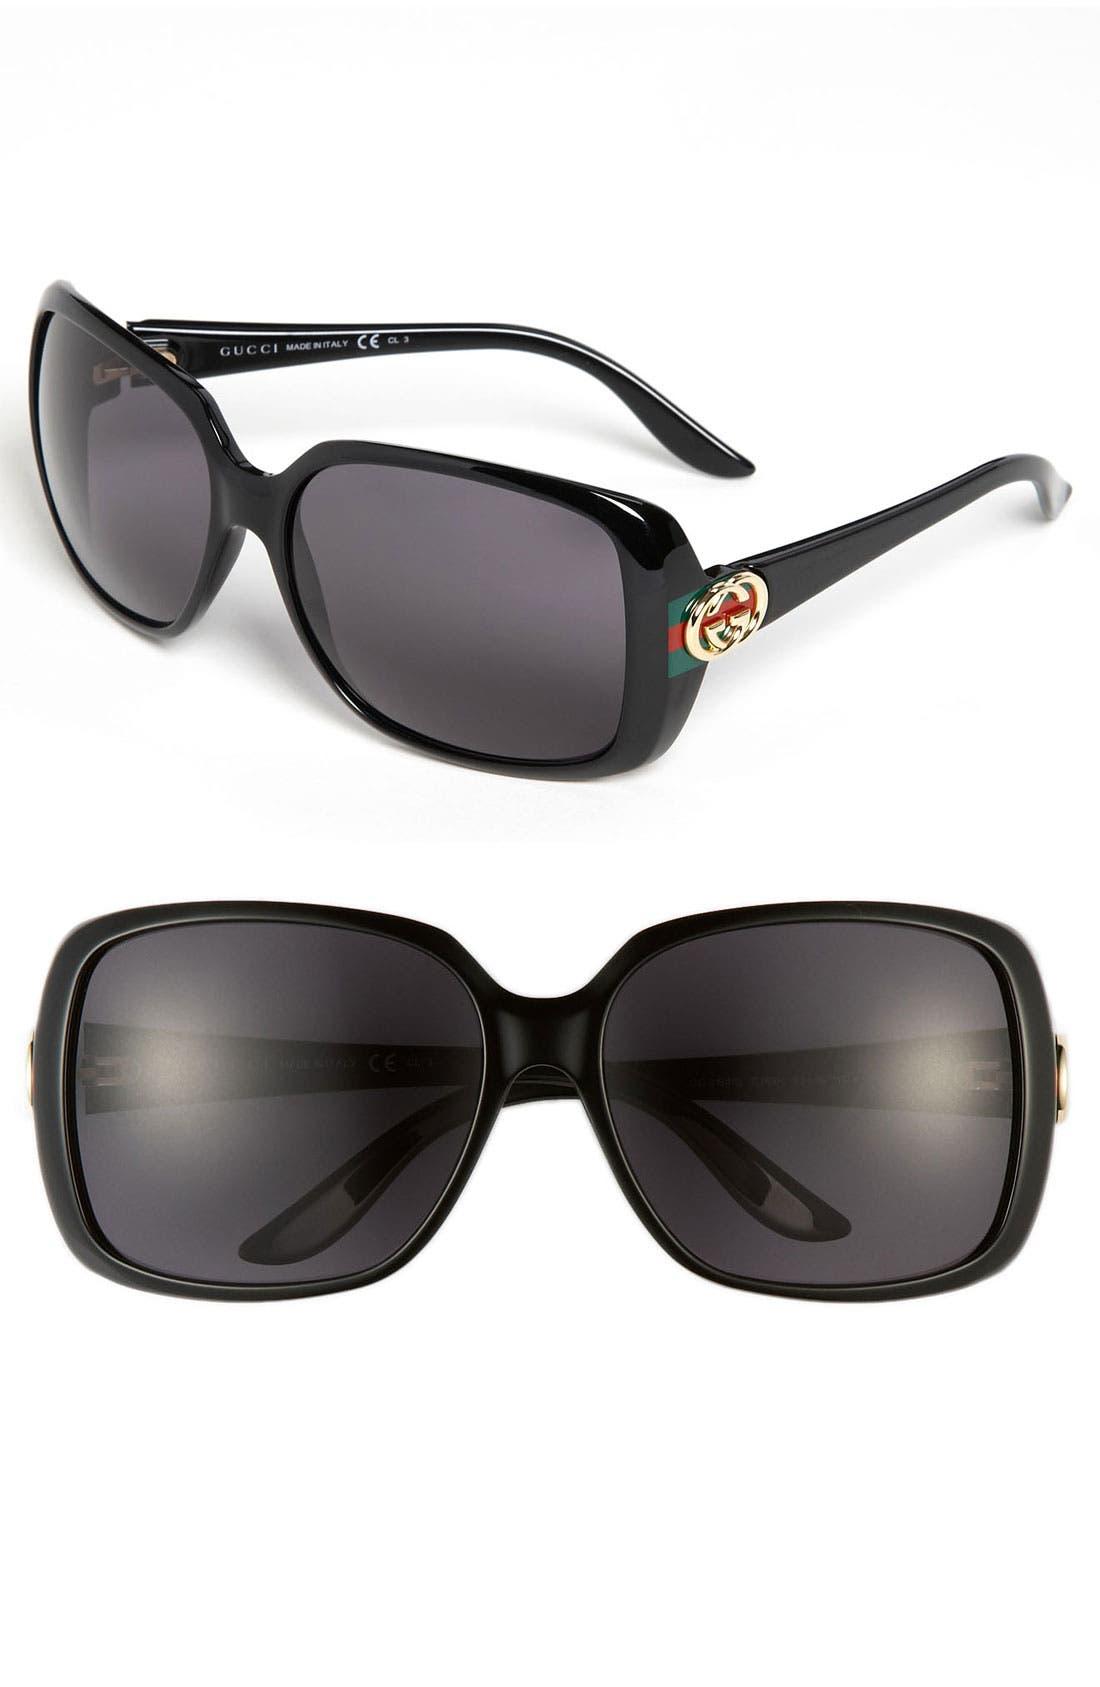 Alternate Image 1 Selected - Gucci 59mm Polarized Sunglasses